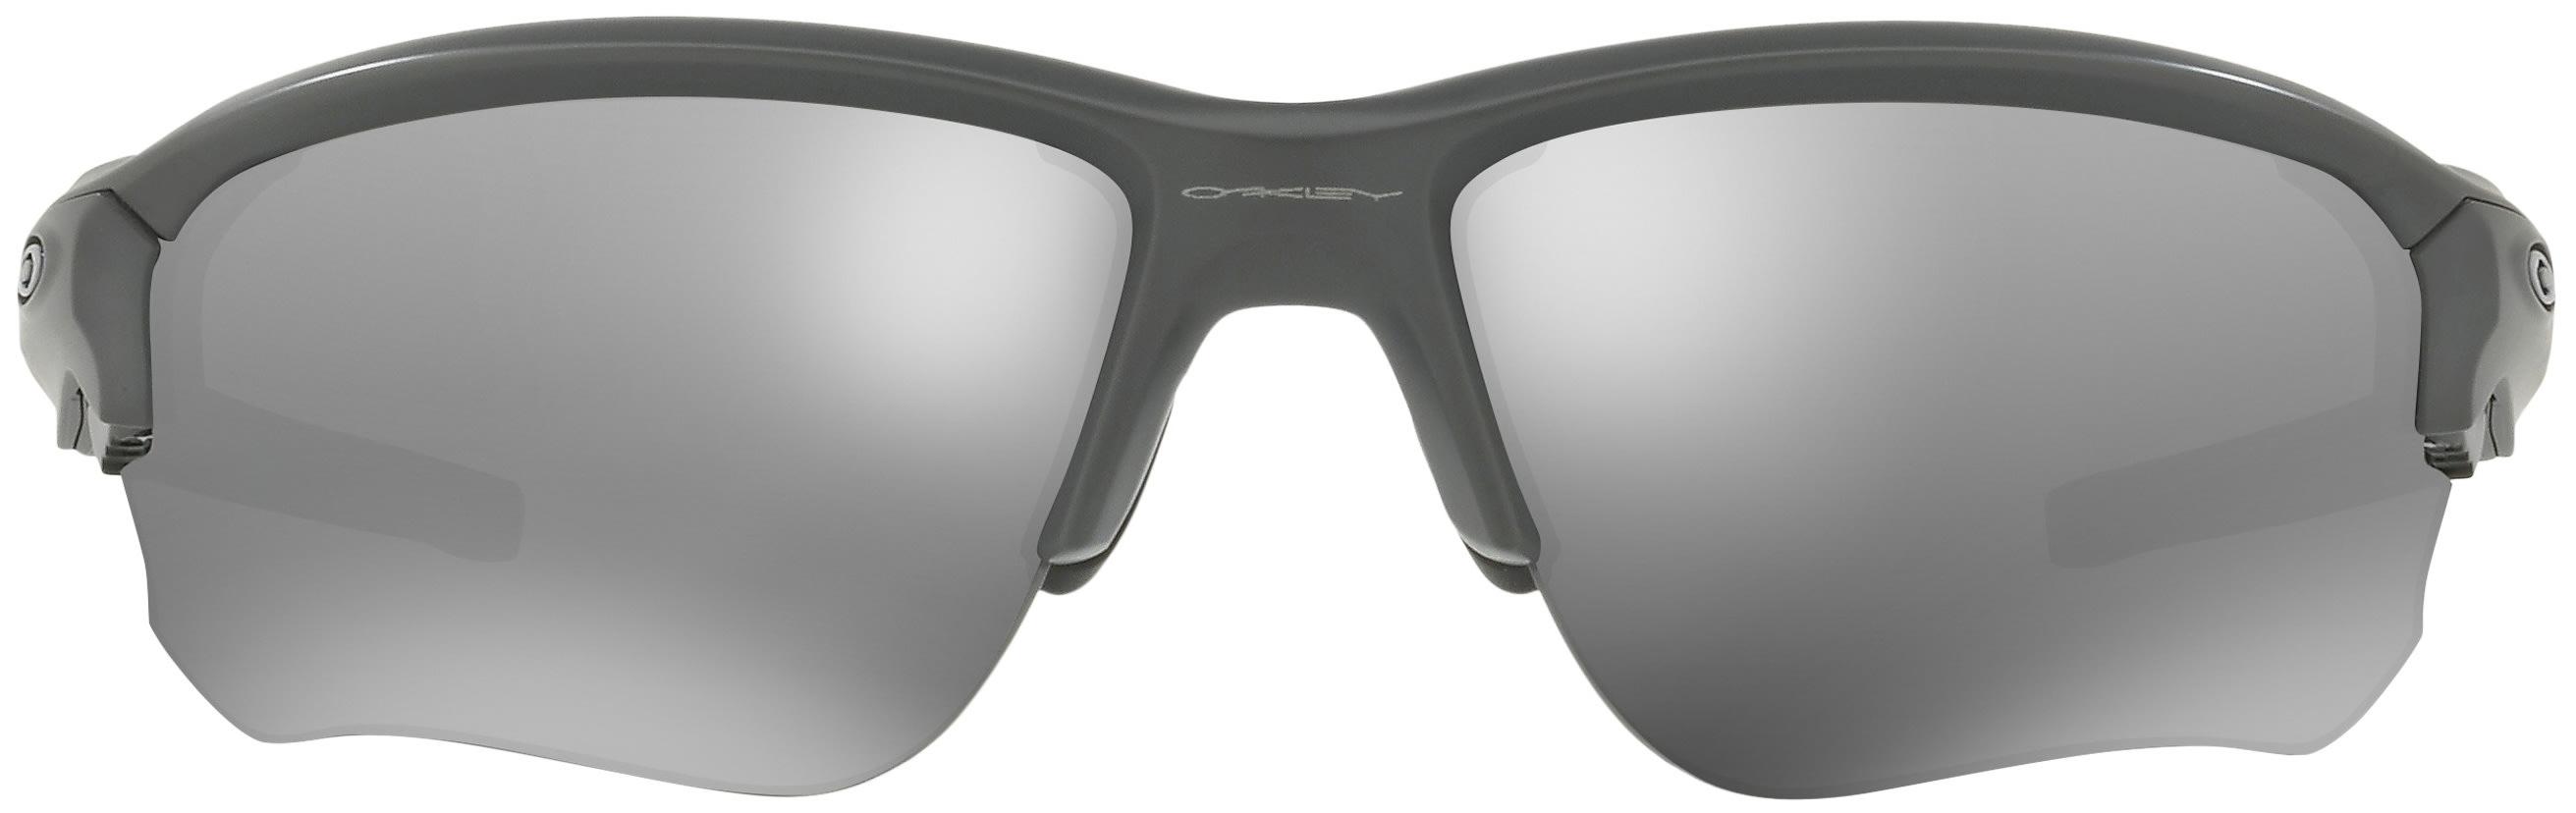 b5400165ae Oakley Flak Draft Sunglasses - thumbnail 2